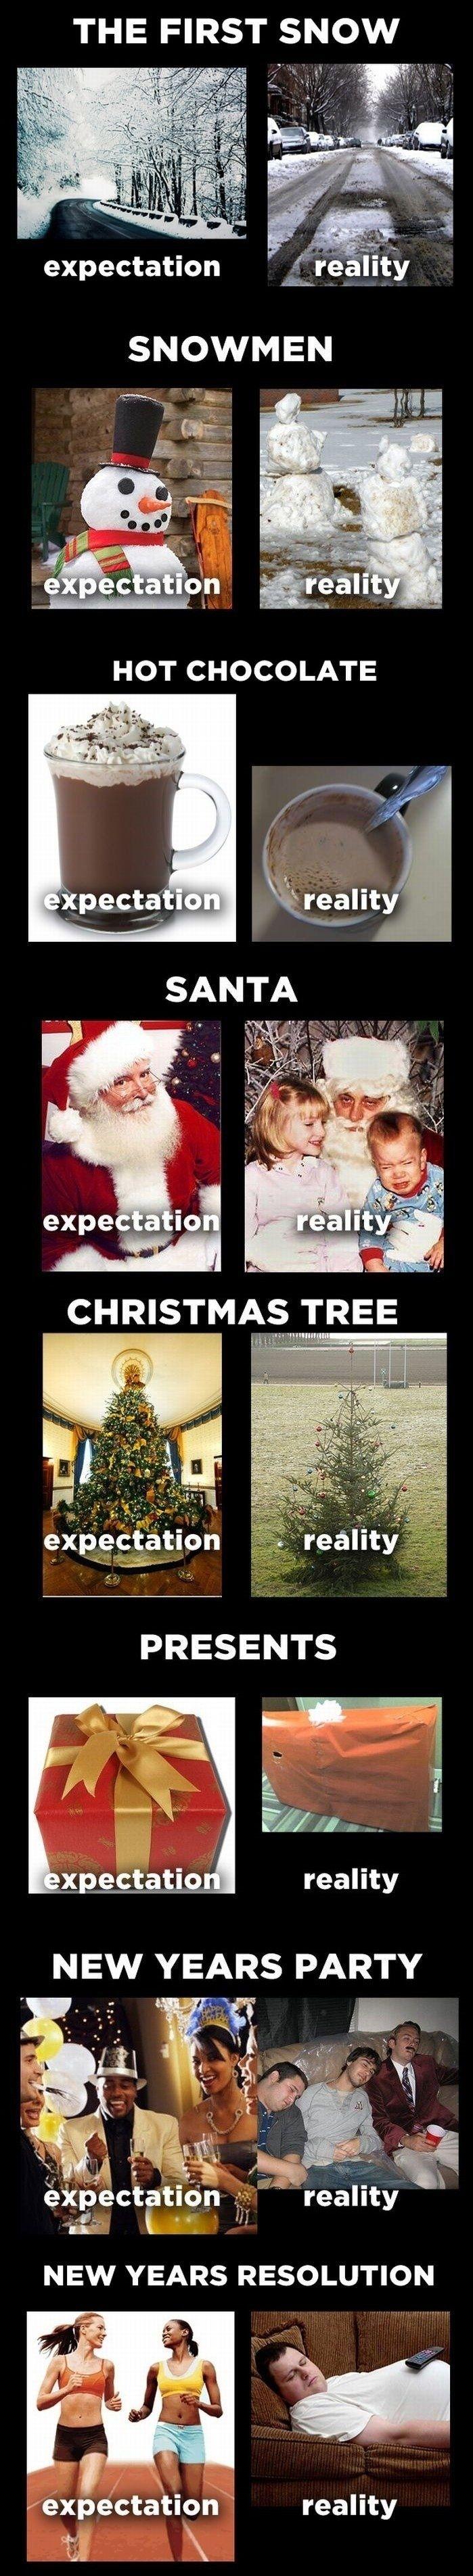 truth of the holidays.Funny Stuff, So True, Expecting Vs Reality, So Funny, Expectation Vs Reality, Happy Holiday, New Years, True Stories, The Holiday